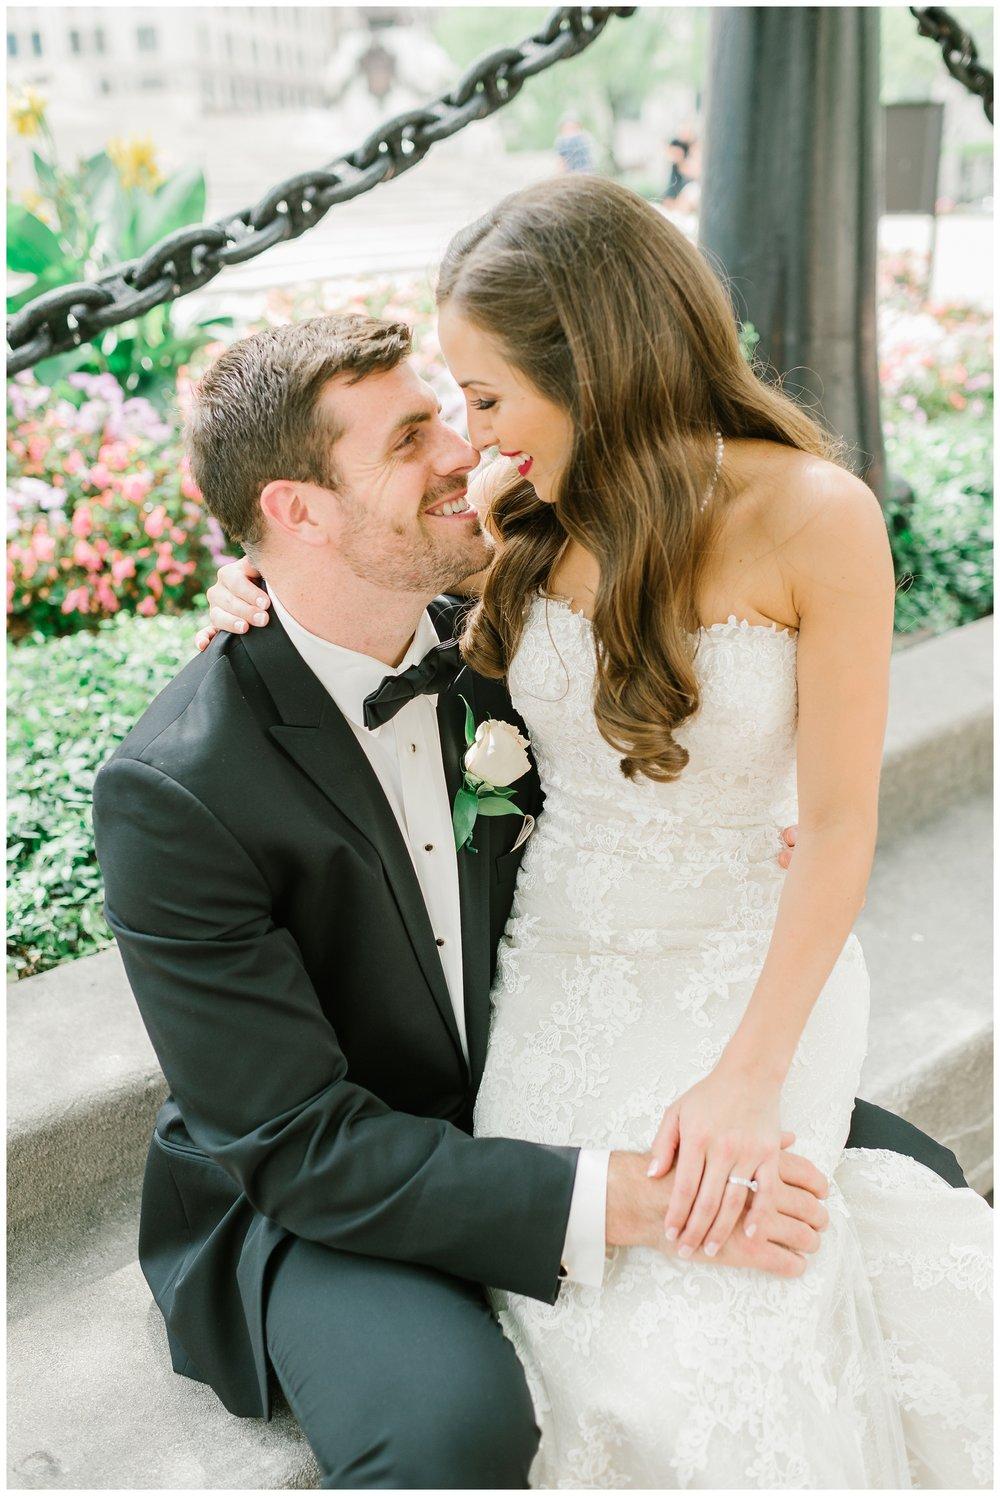 Rebecca_Bridges_Photography_Indianapolis_Wedding_Photographer_6831.jpg